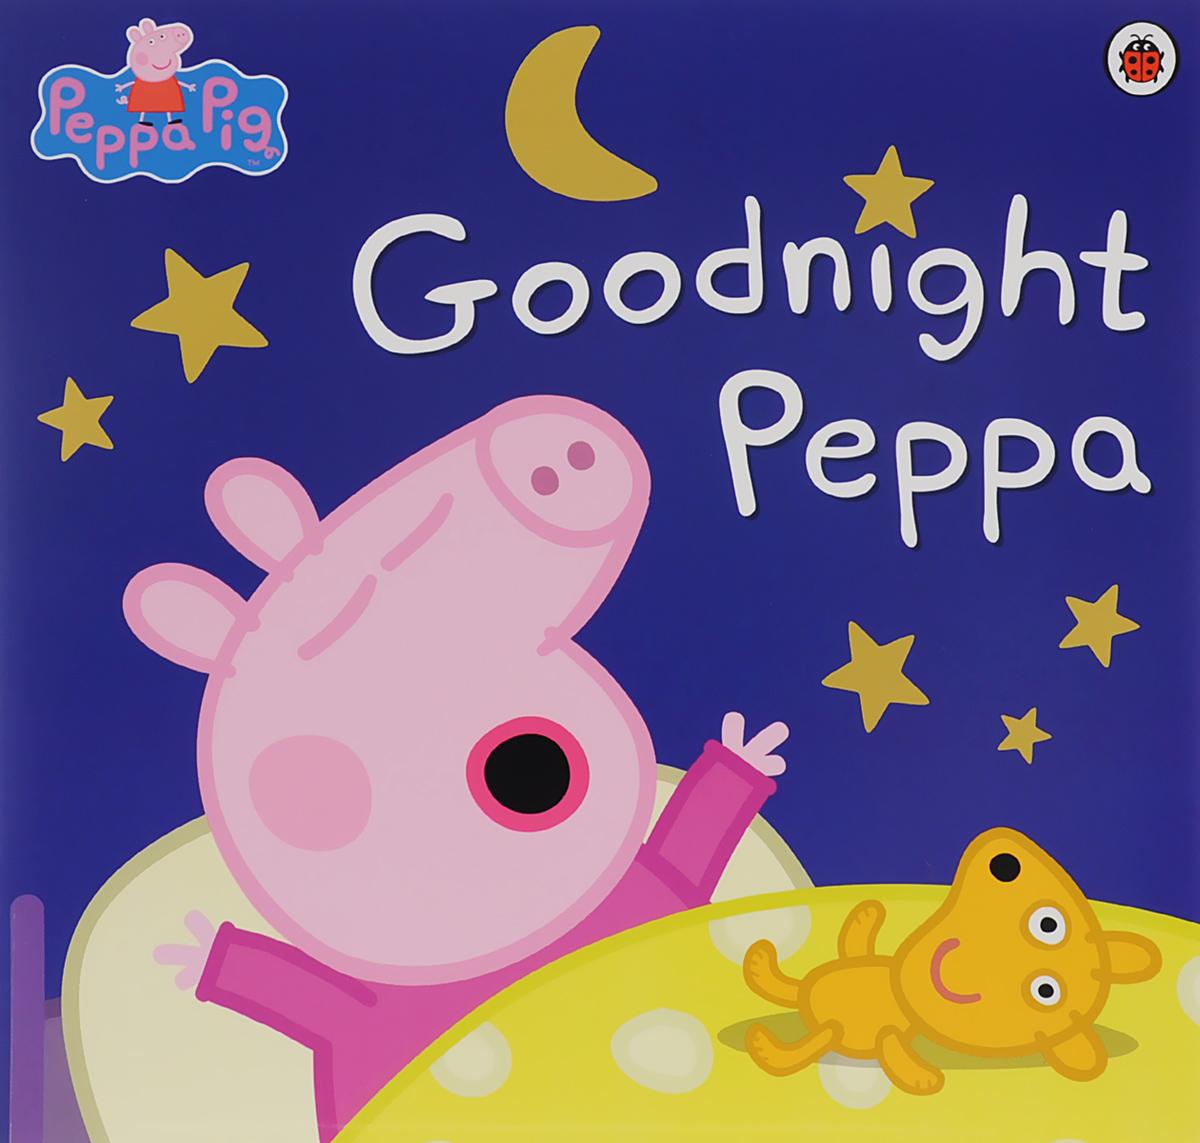 Goodnight Peppa  mandy archer peppa pig my granny